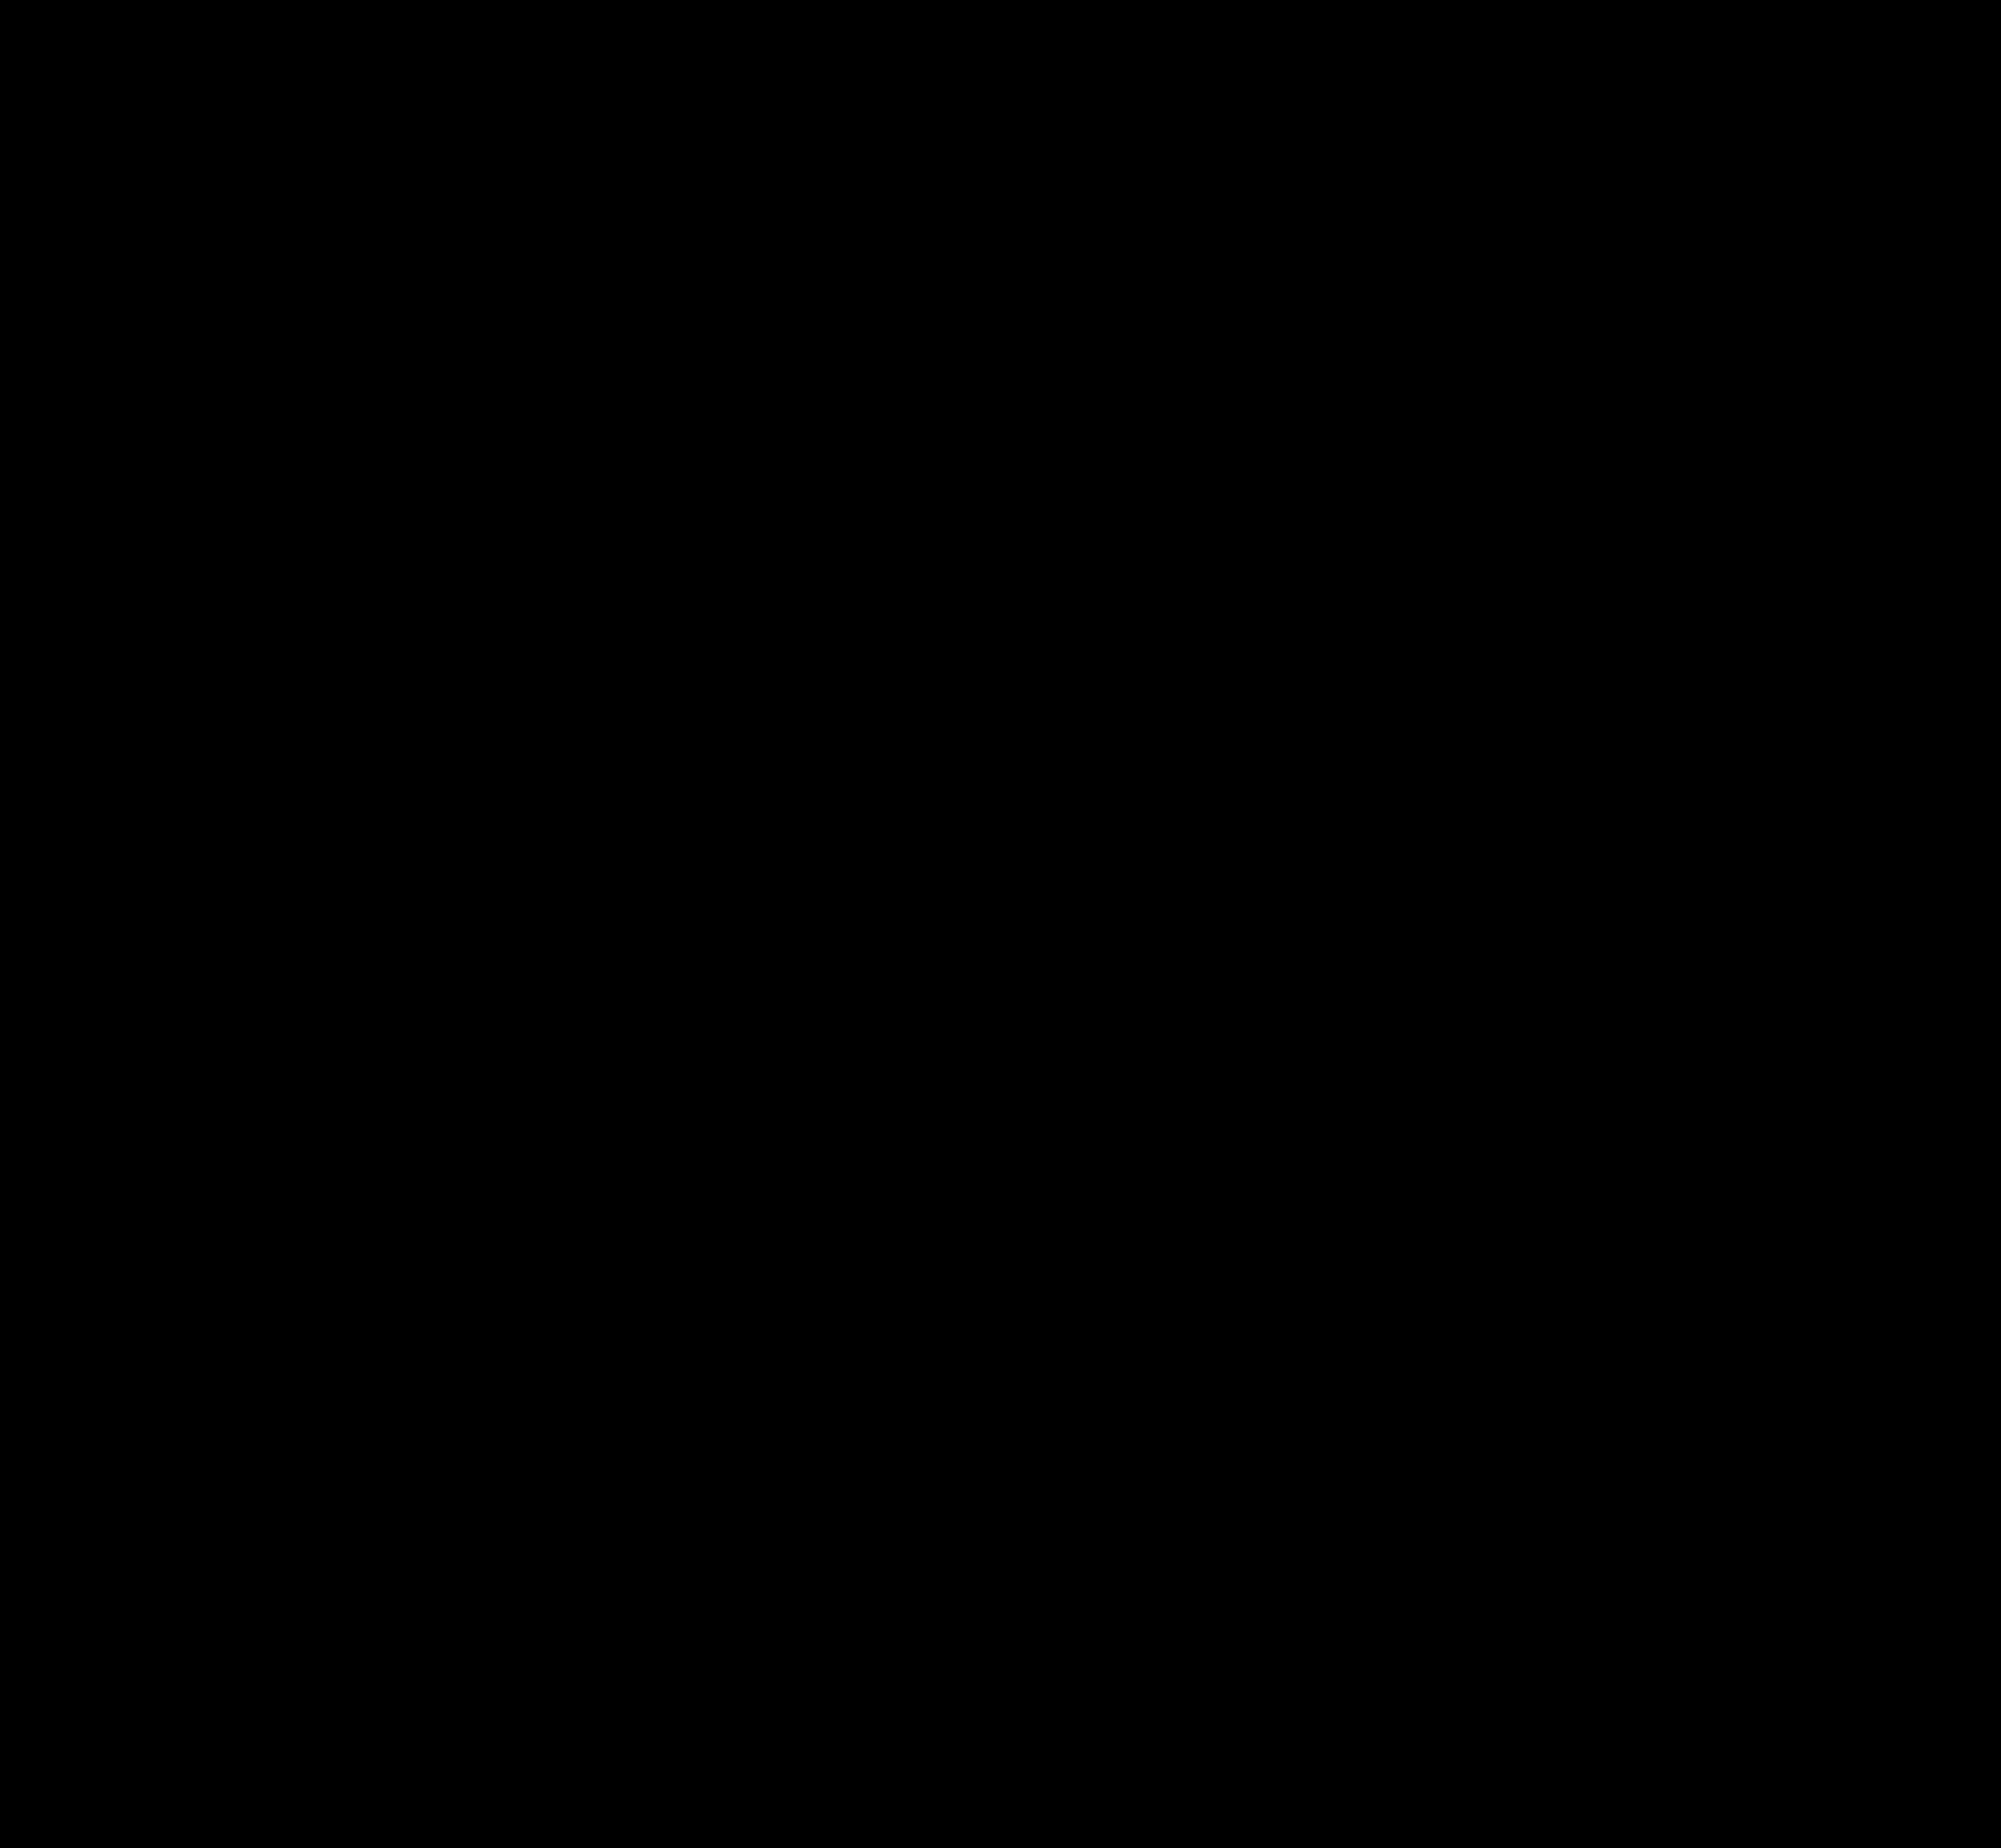 2400x2216 Clipart